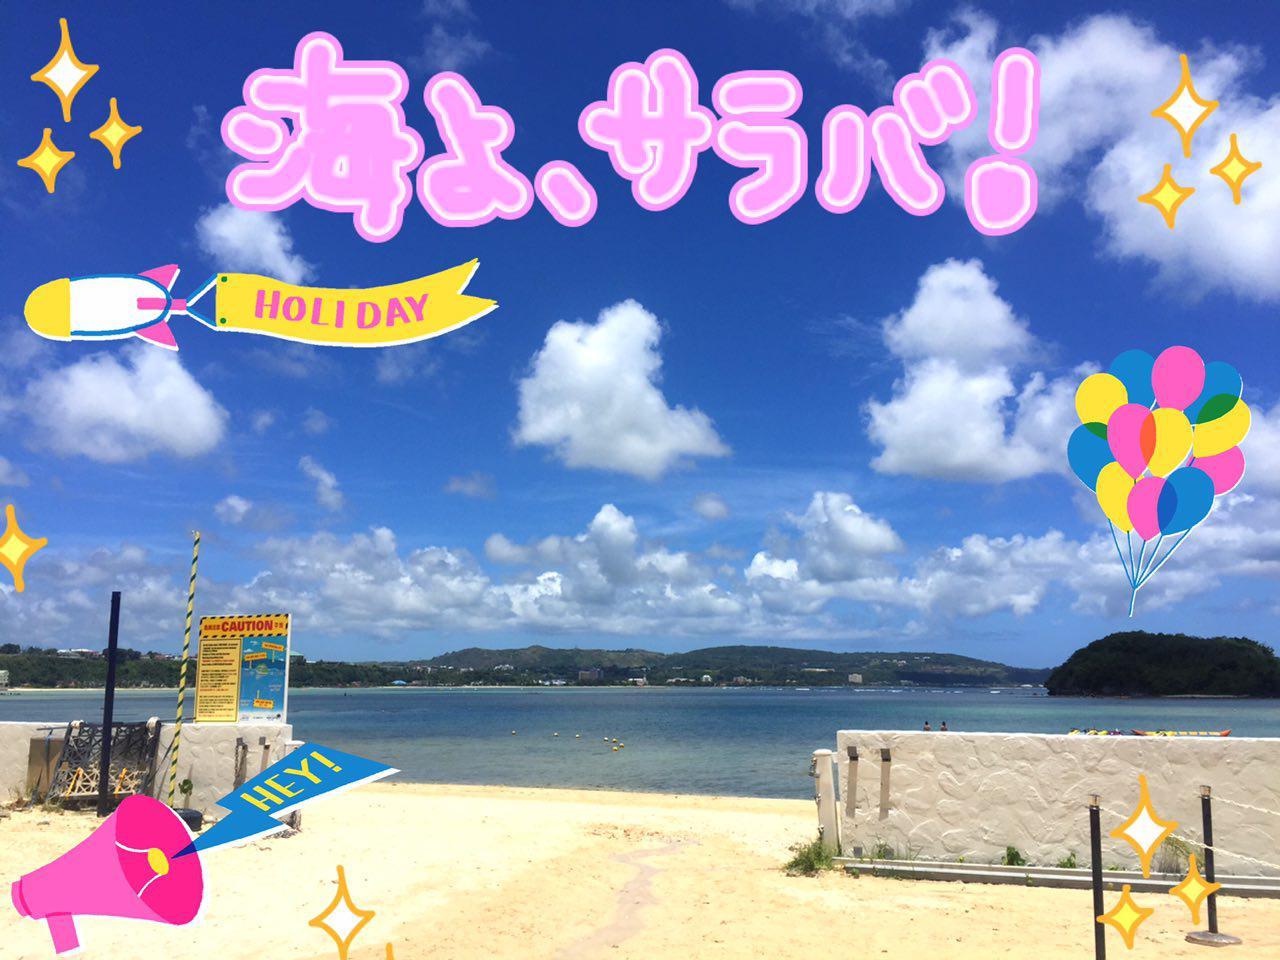 photo_2017-06-09_20-47-49.jpg